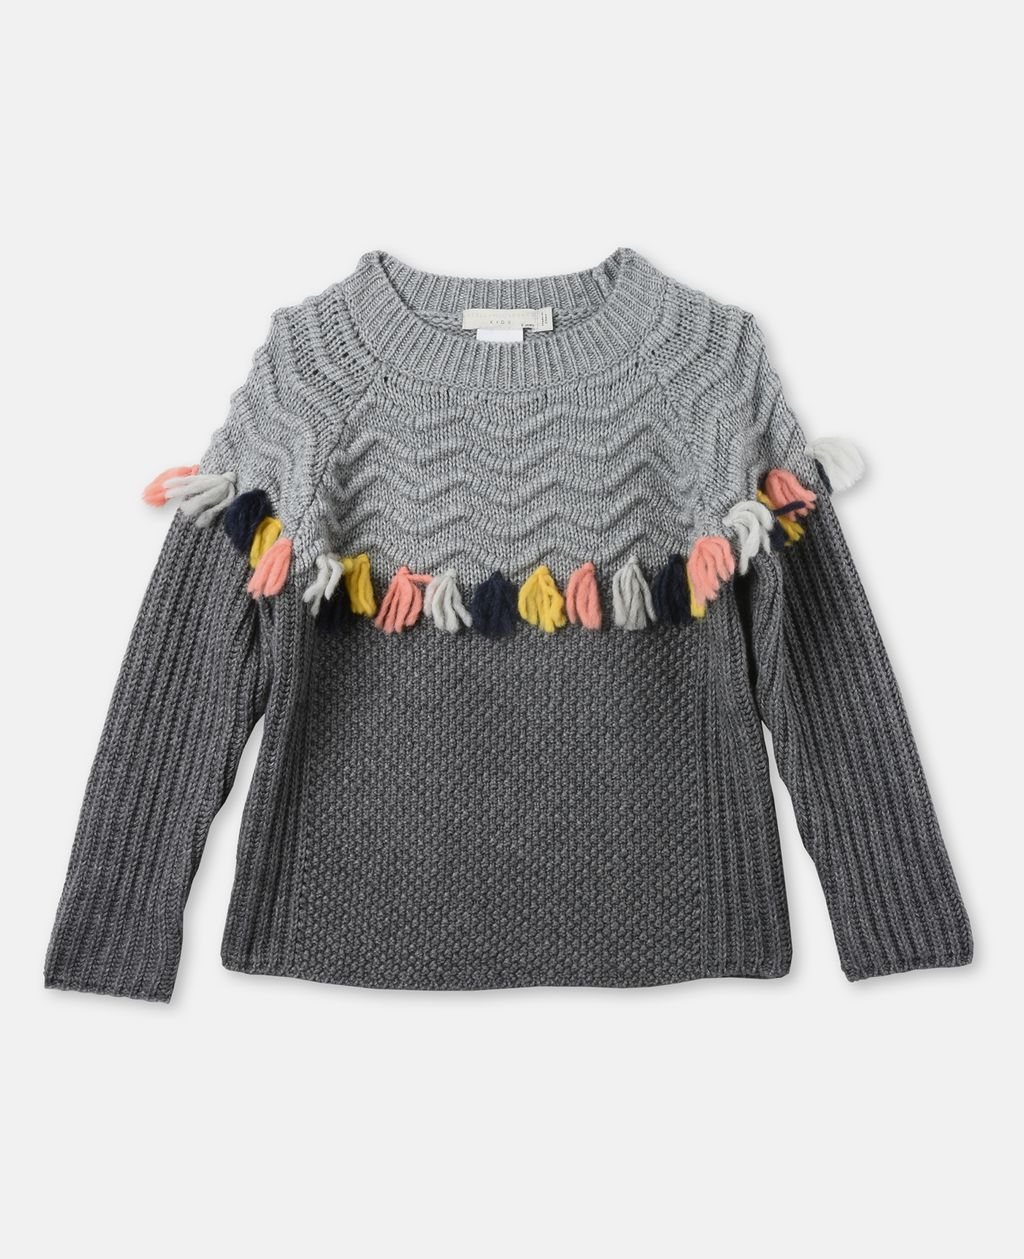 Tangerine Gray Tassel Sweater - STELLA MCCARTNEY KIDS